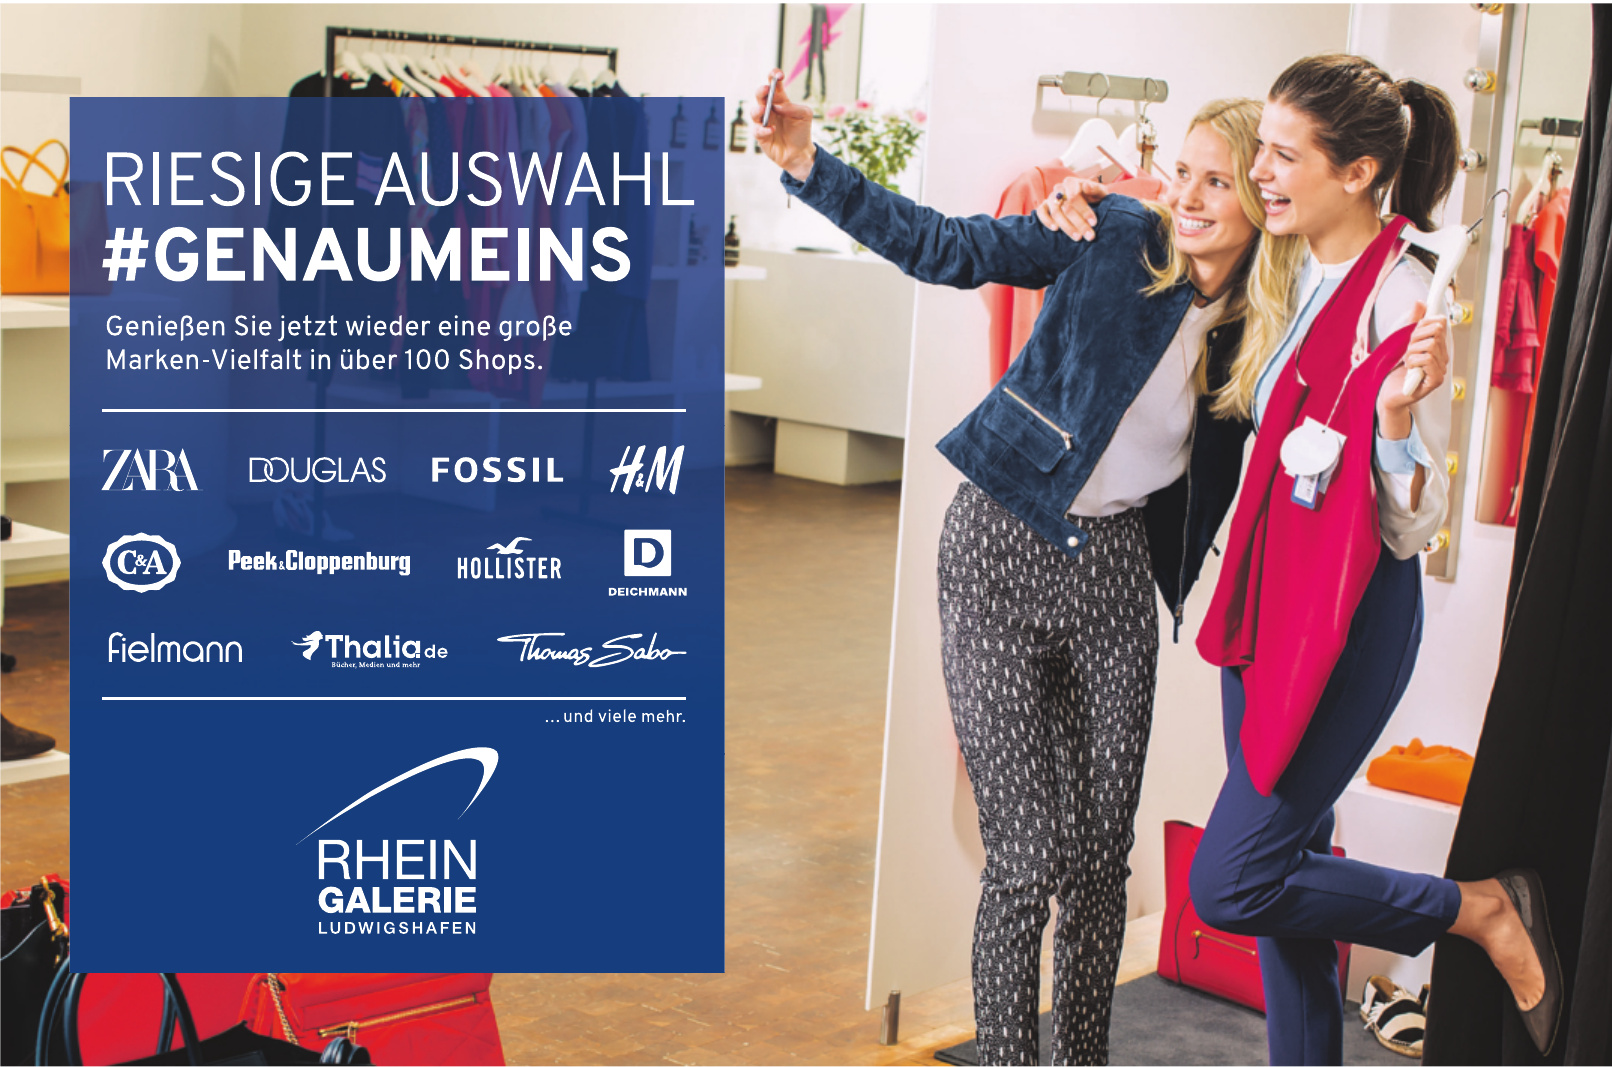 Rhein Galerie Ludwigshafen